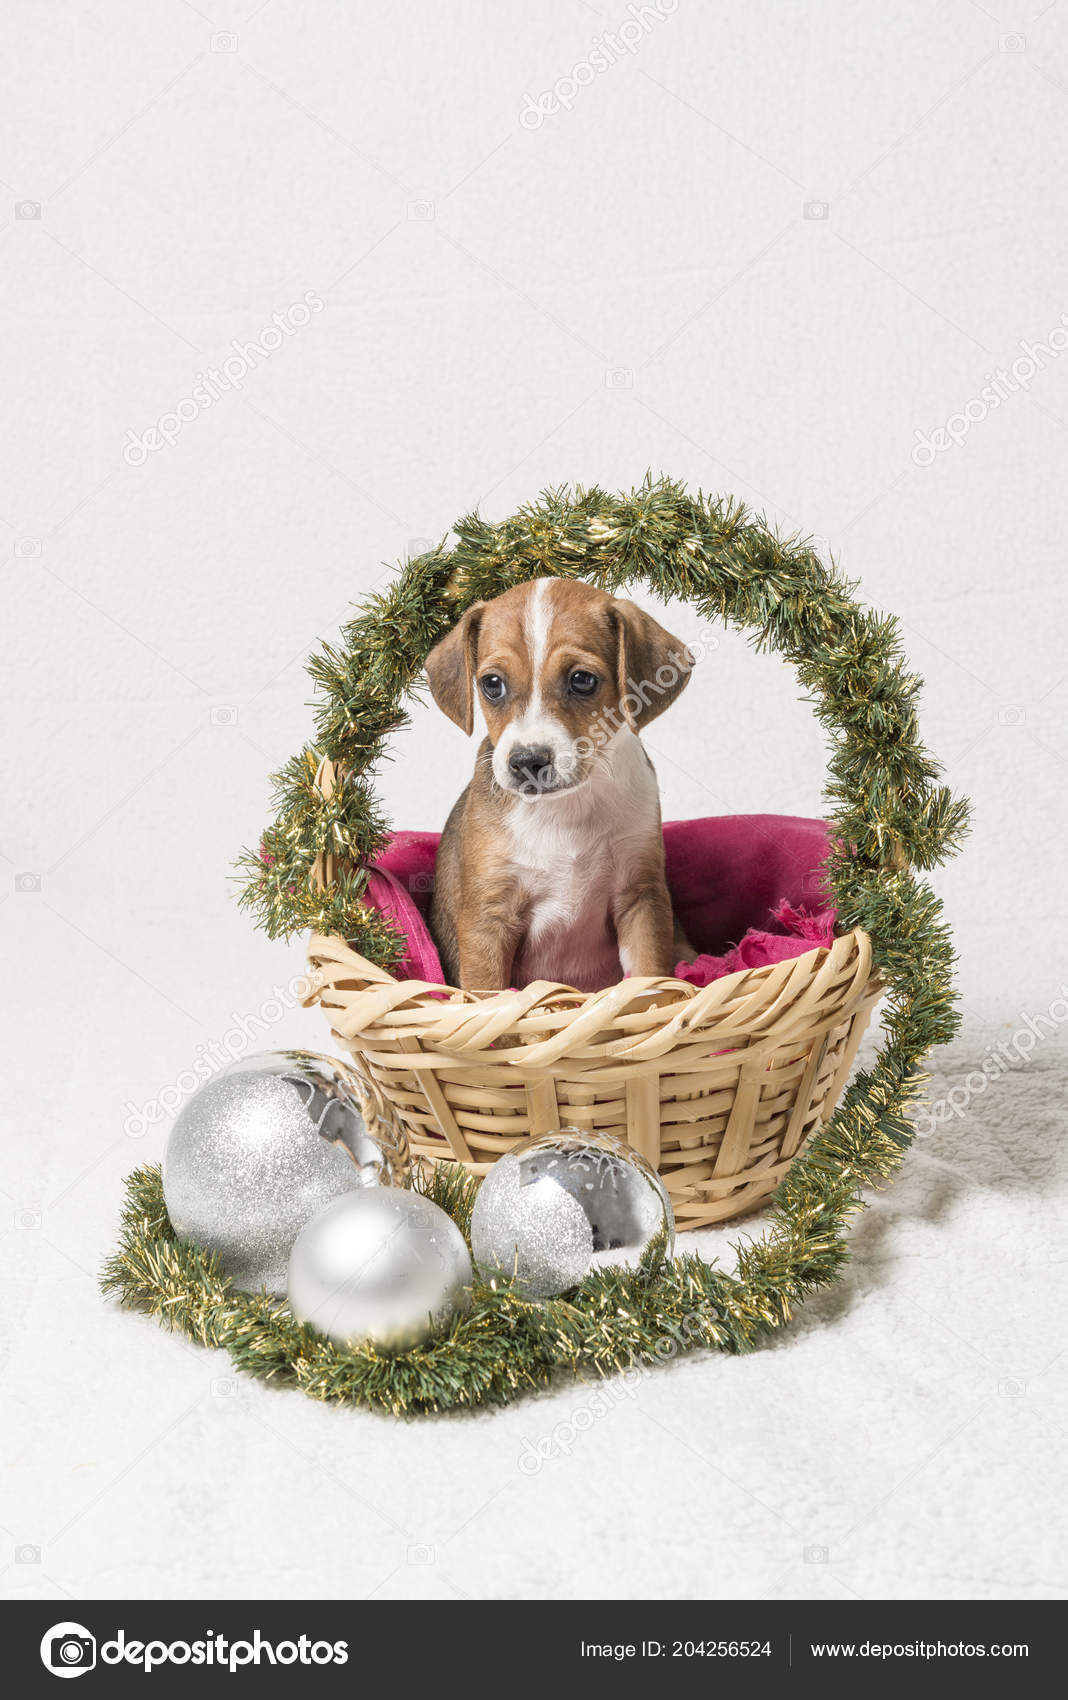 Puppy Basket Christmas Decorations White Background — Stock Photo